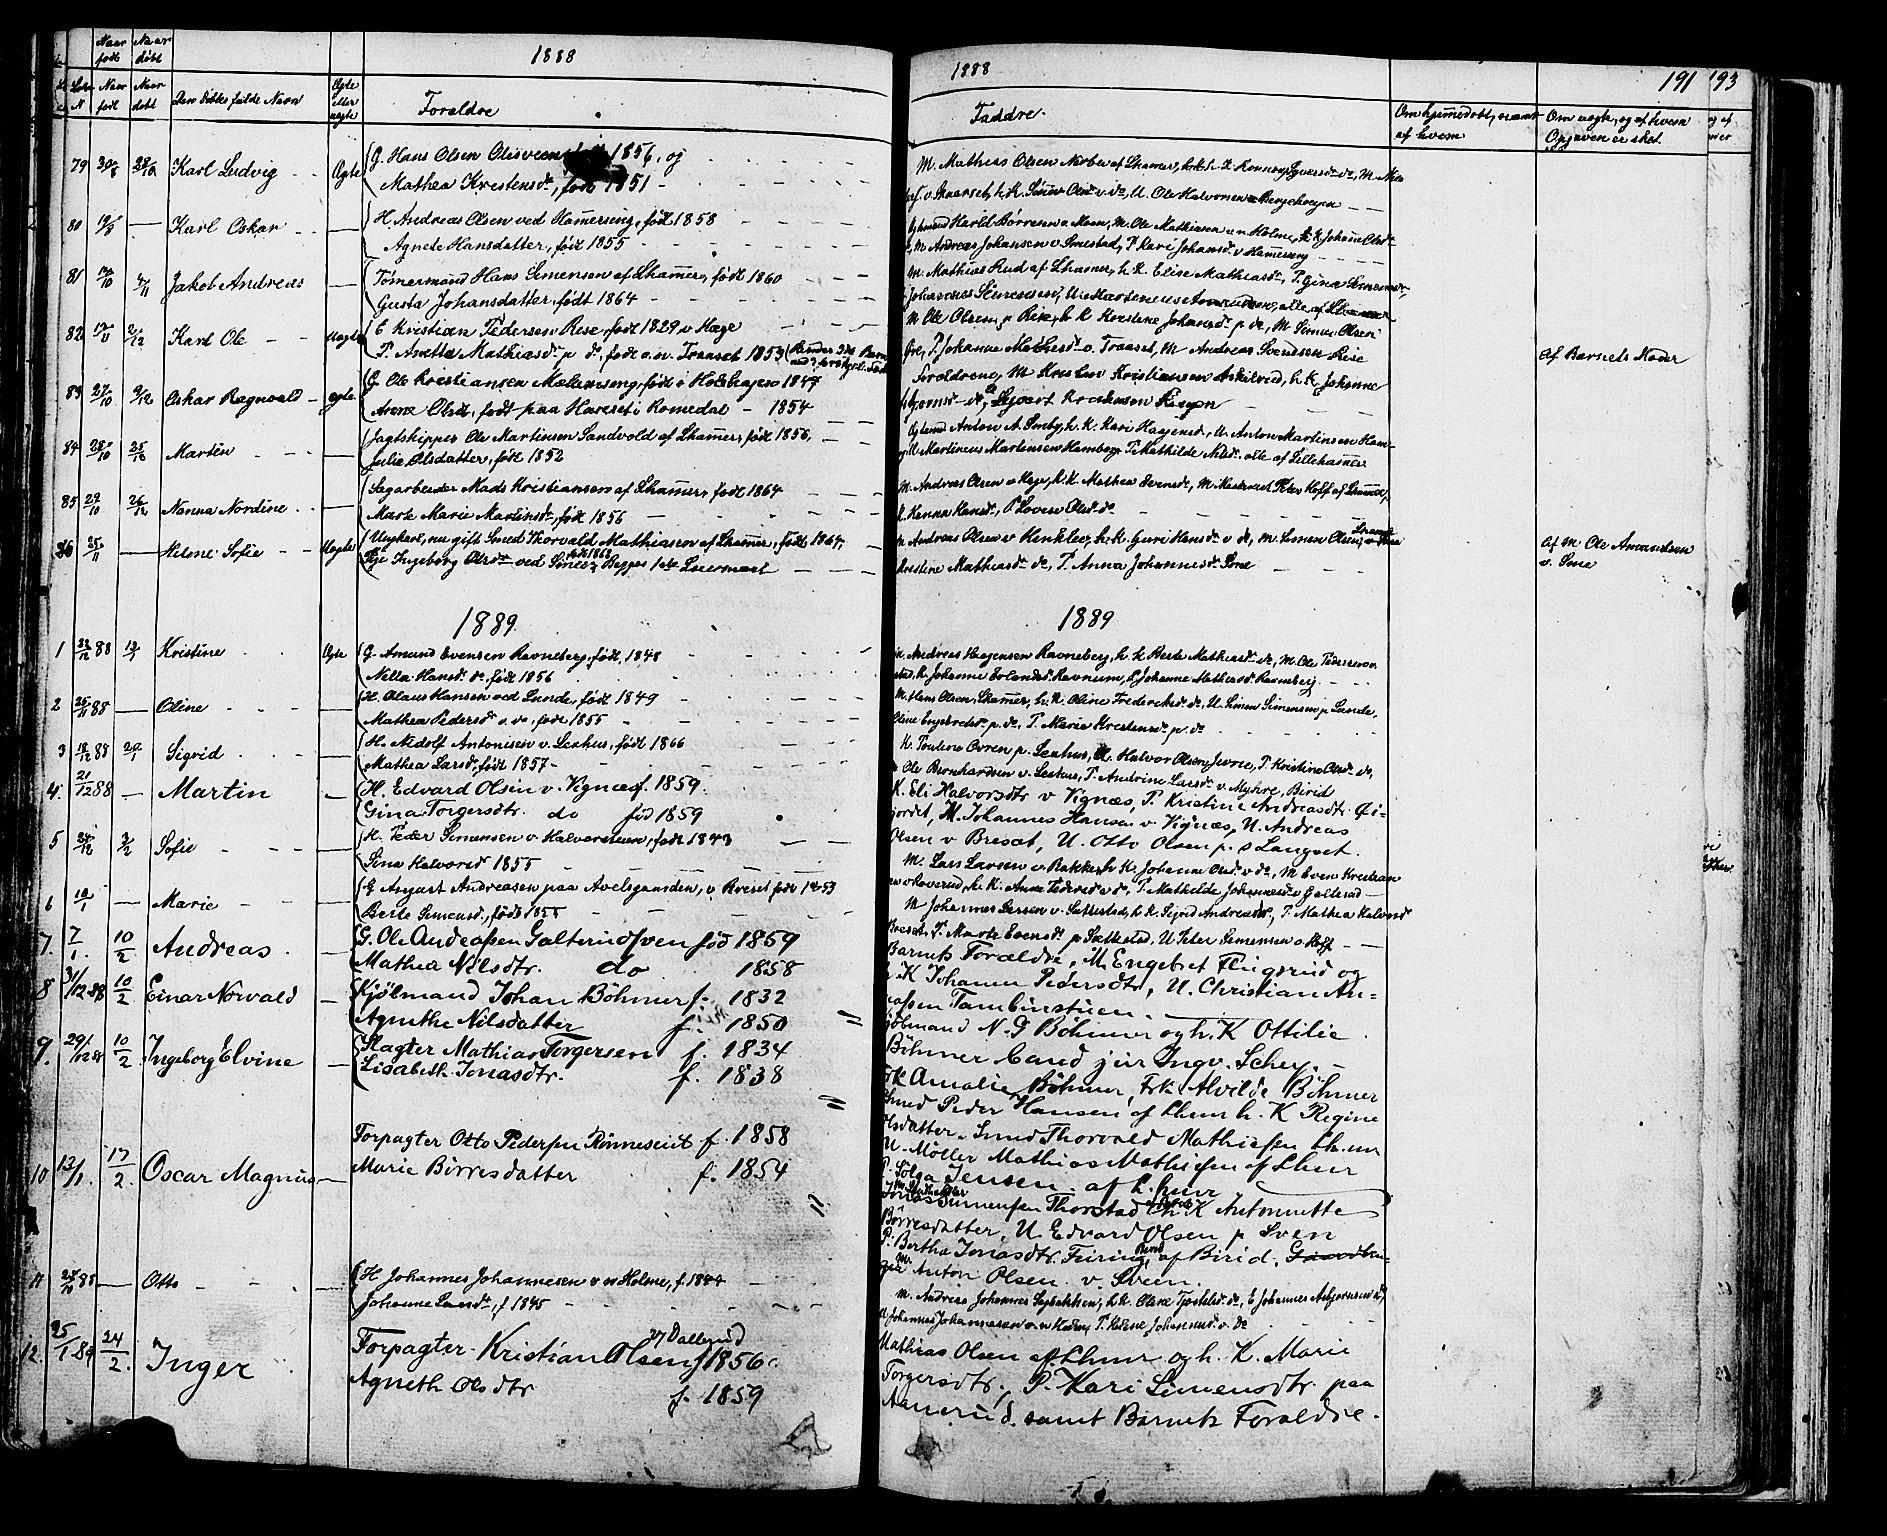 SAH, Fåberg prestekontor, Klokkerbok nr. 7, 1856-1891, s. 190-191